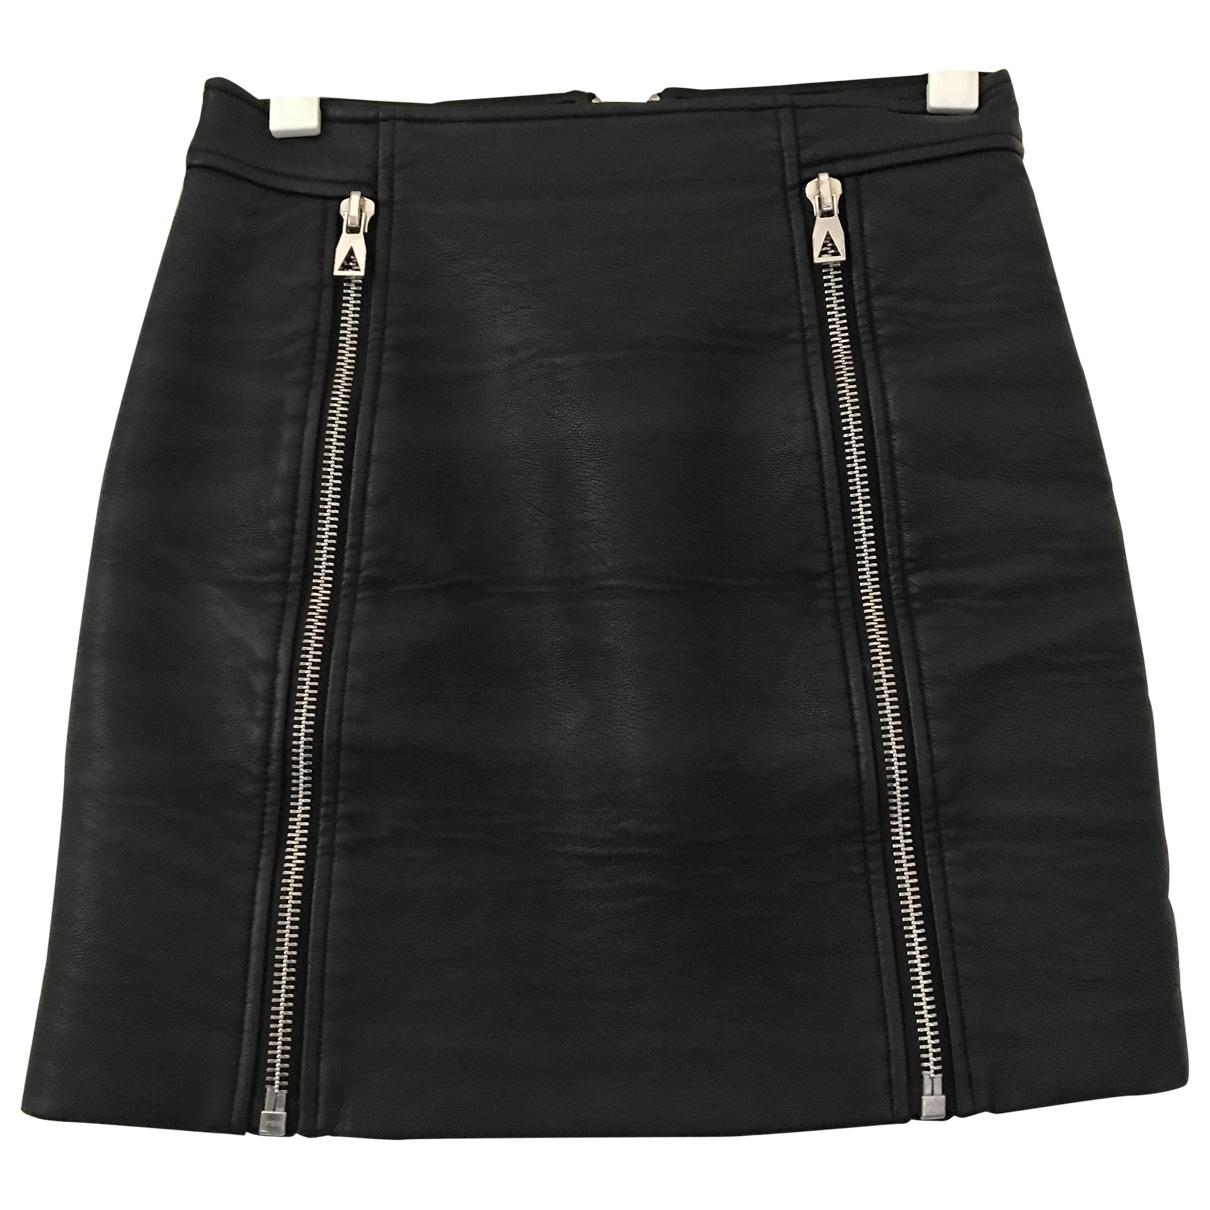 Eleven Paris \N Black Leather skirt for Women M International